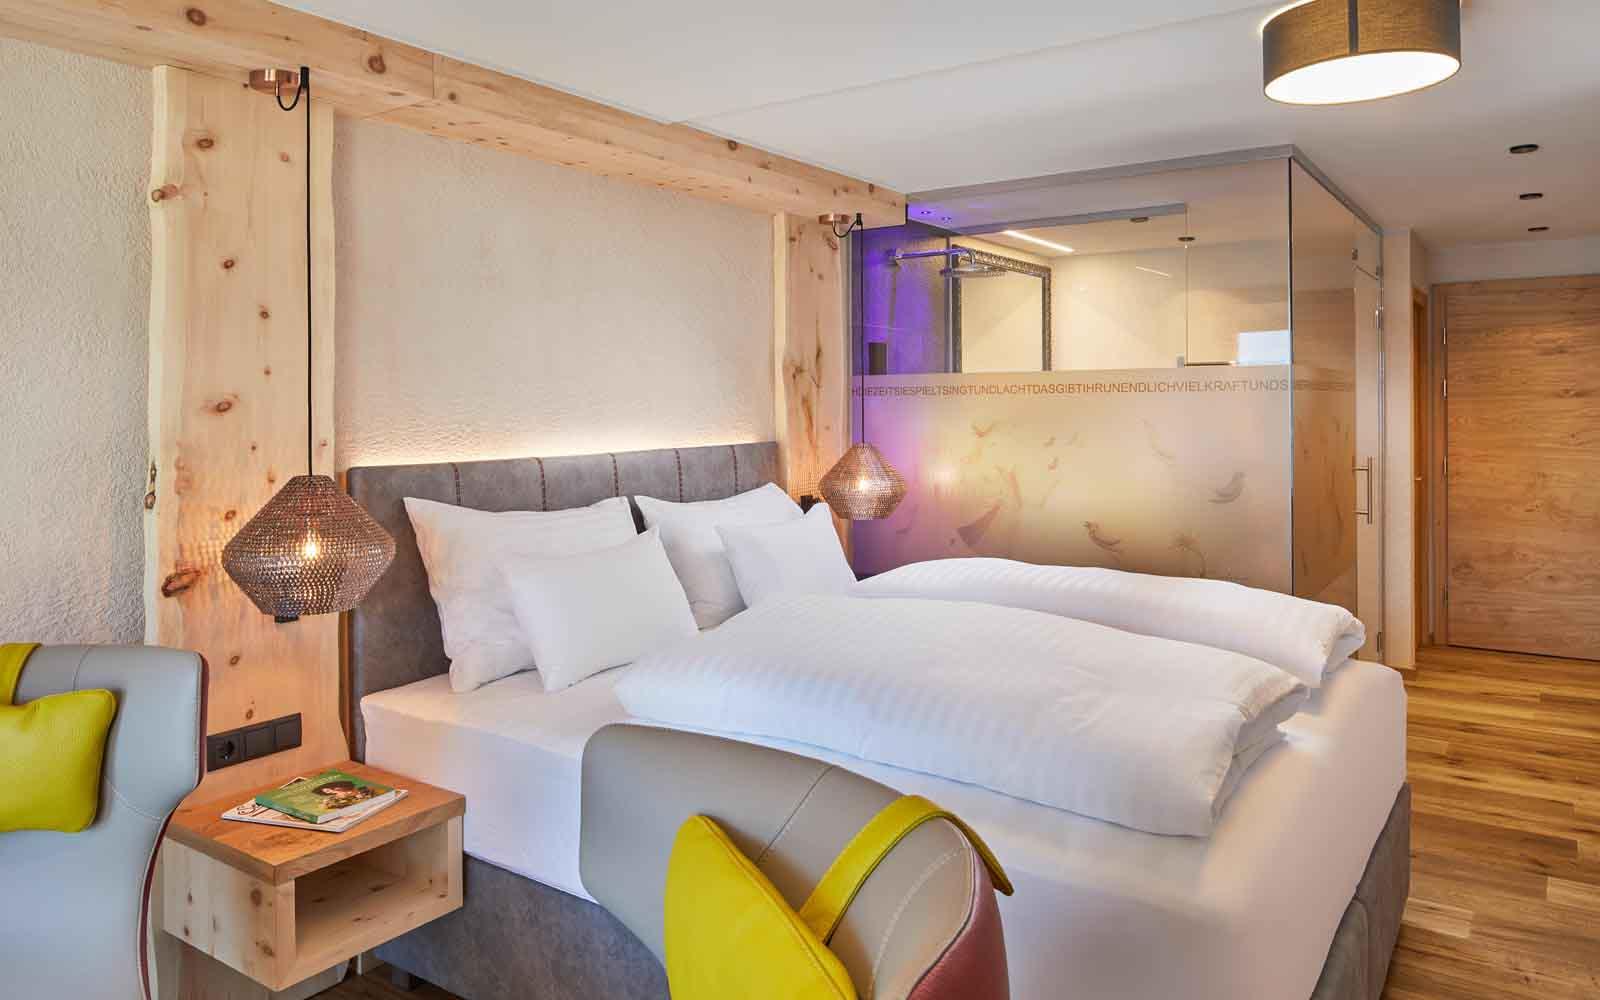 niche destinations Hotel Tirol Fiss Ladis-Fiss-Serfaus Tirol Austria Lifestyle-Hotel 22 new modern-Alpine styled rooms